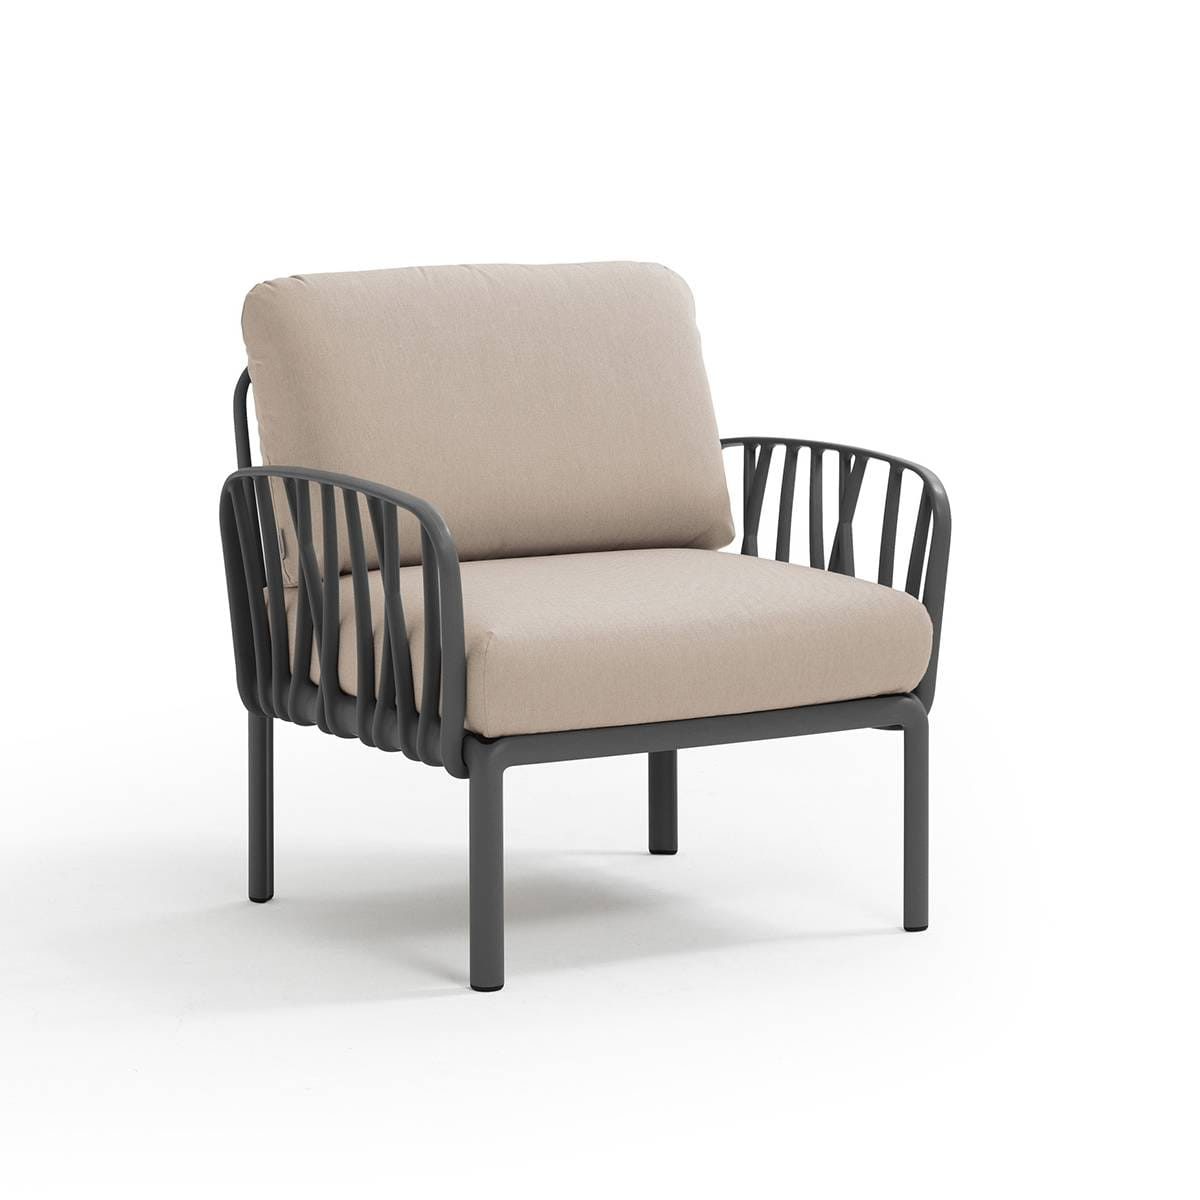 Nardi Sofa Komodo Poltrona Antracyt-Canvas